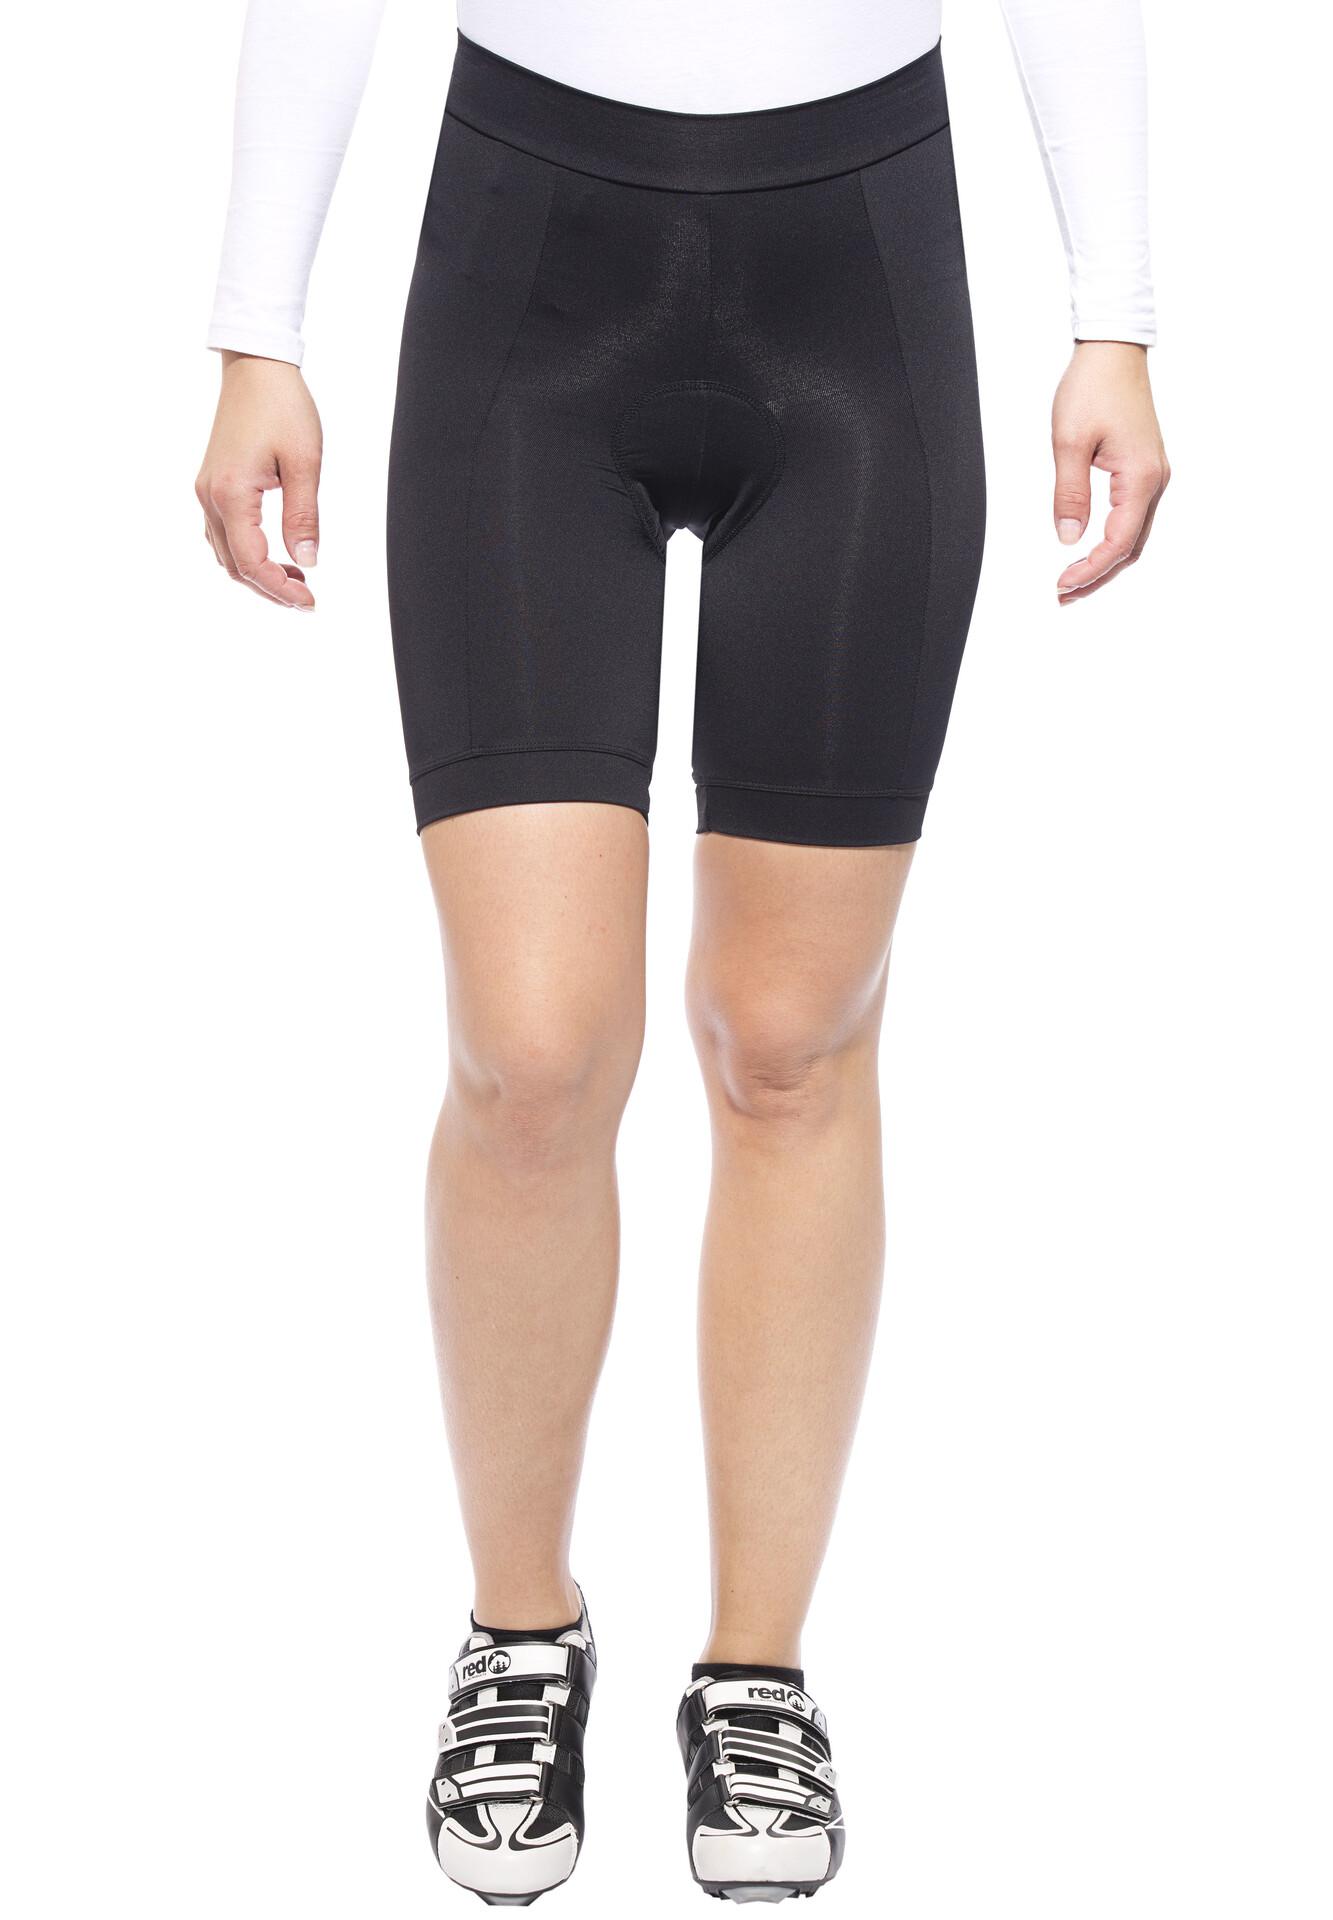 V2 Gonso Pantalon De FemmeBlack Lisa Cyclisme QCBWodrex